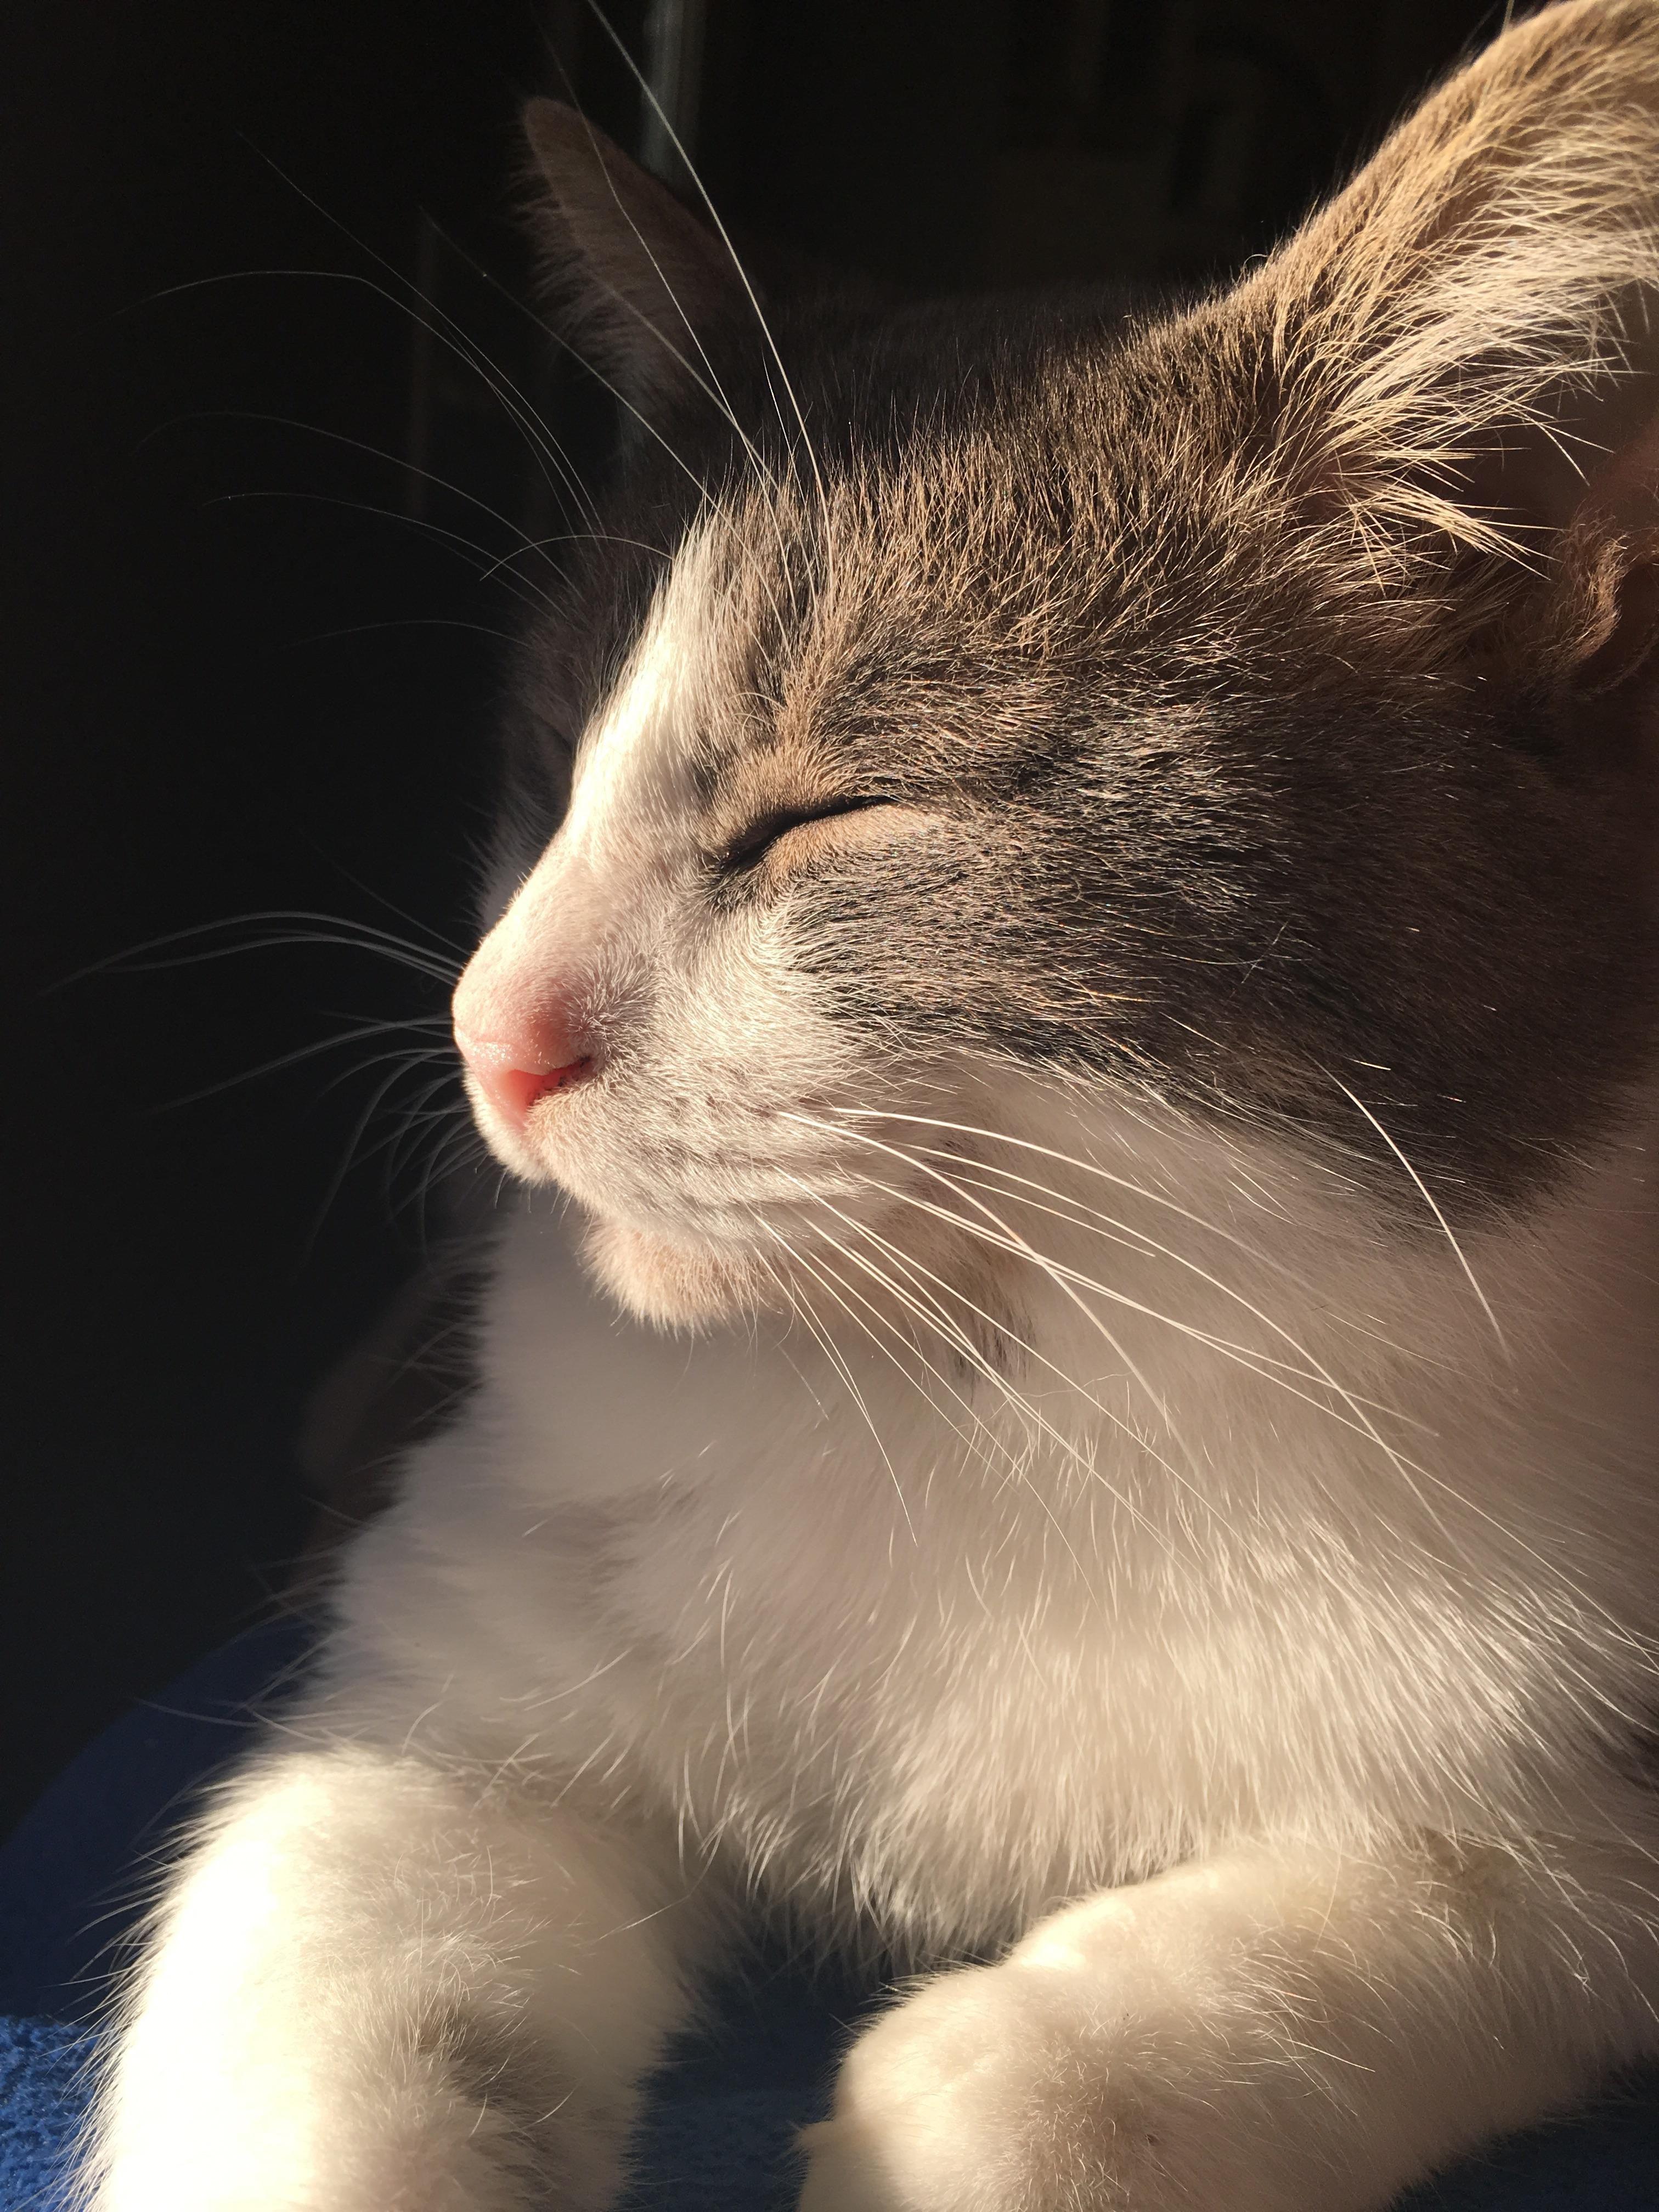 ragdollcat Cute cats, Pretty cats, Cute animals